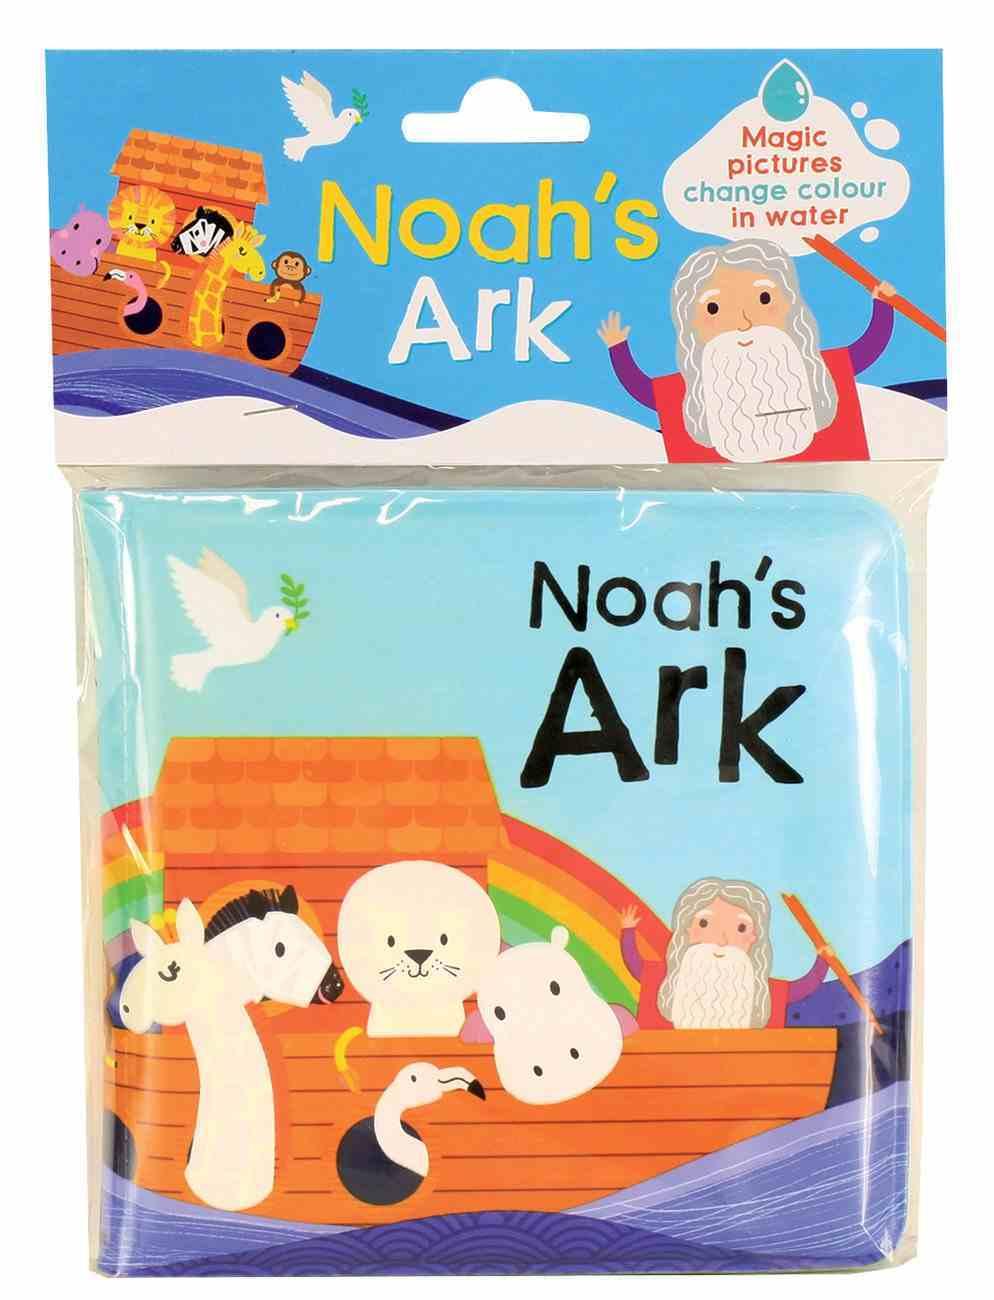 Magic Bible Bath Book: Noah's Ark Novelty Book